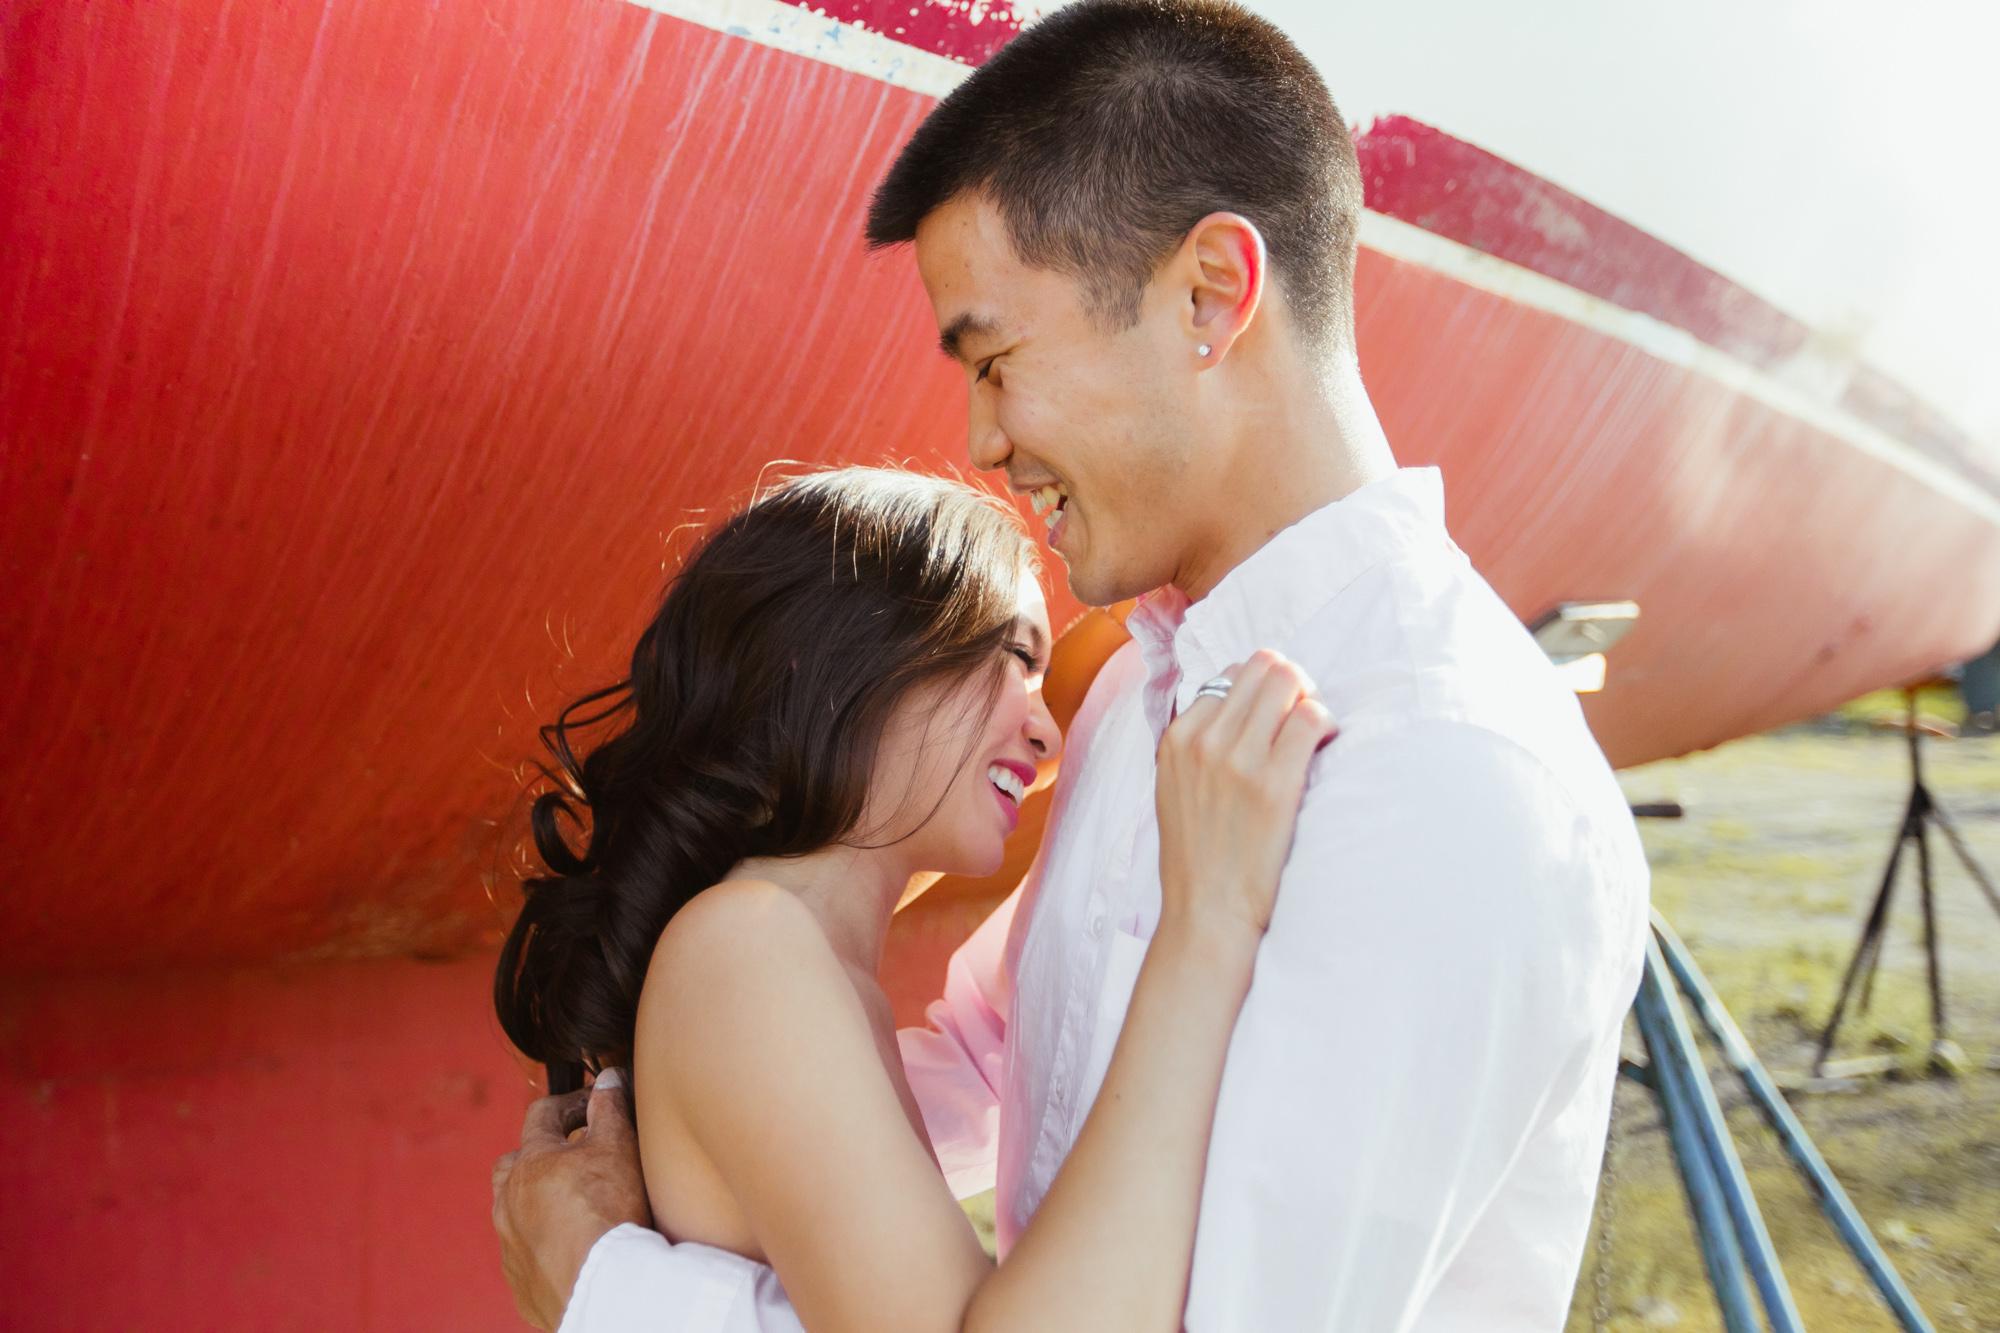 New York Wedding Photographer Boris Zaretsky Liberty Park New Jersey engagement Lisa Mike 5X2A6442 copy.jpg